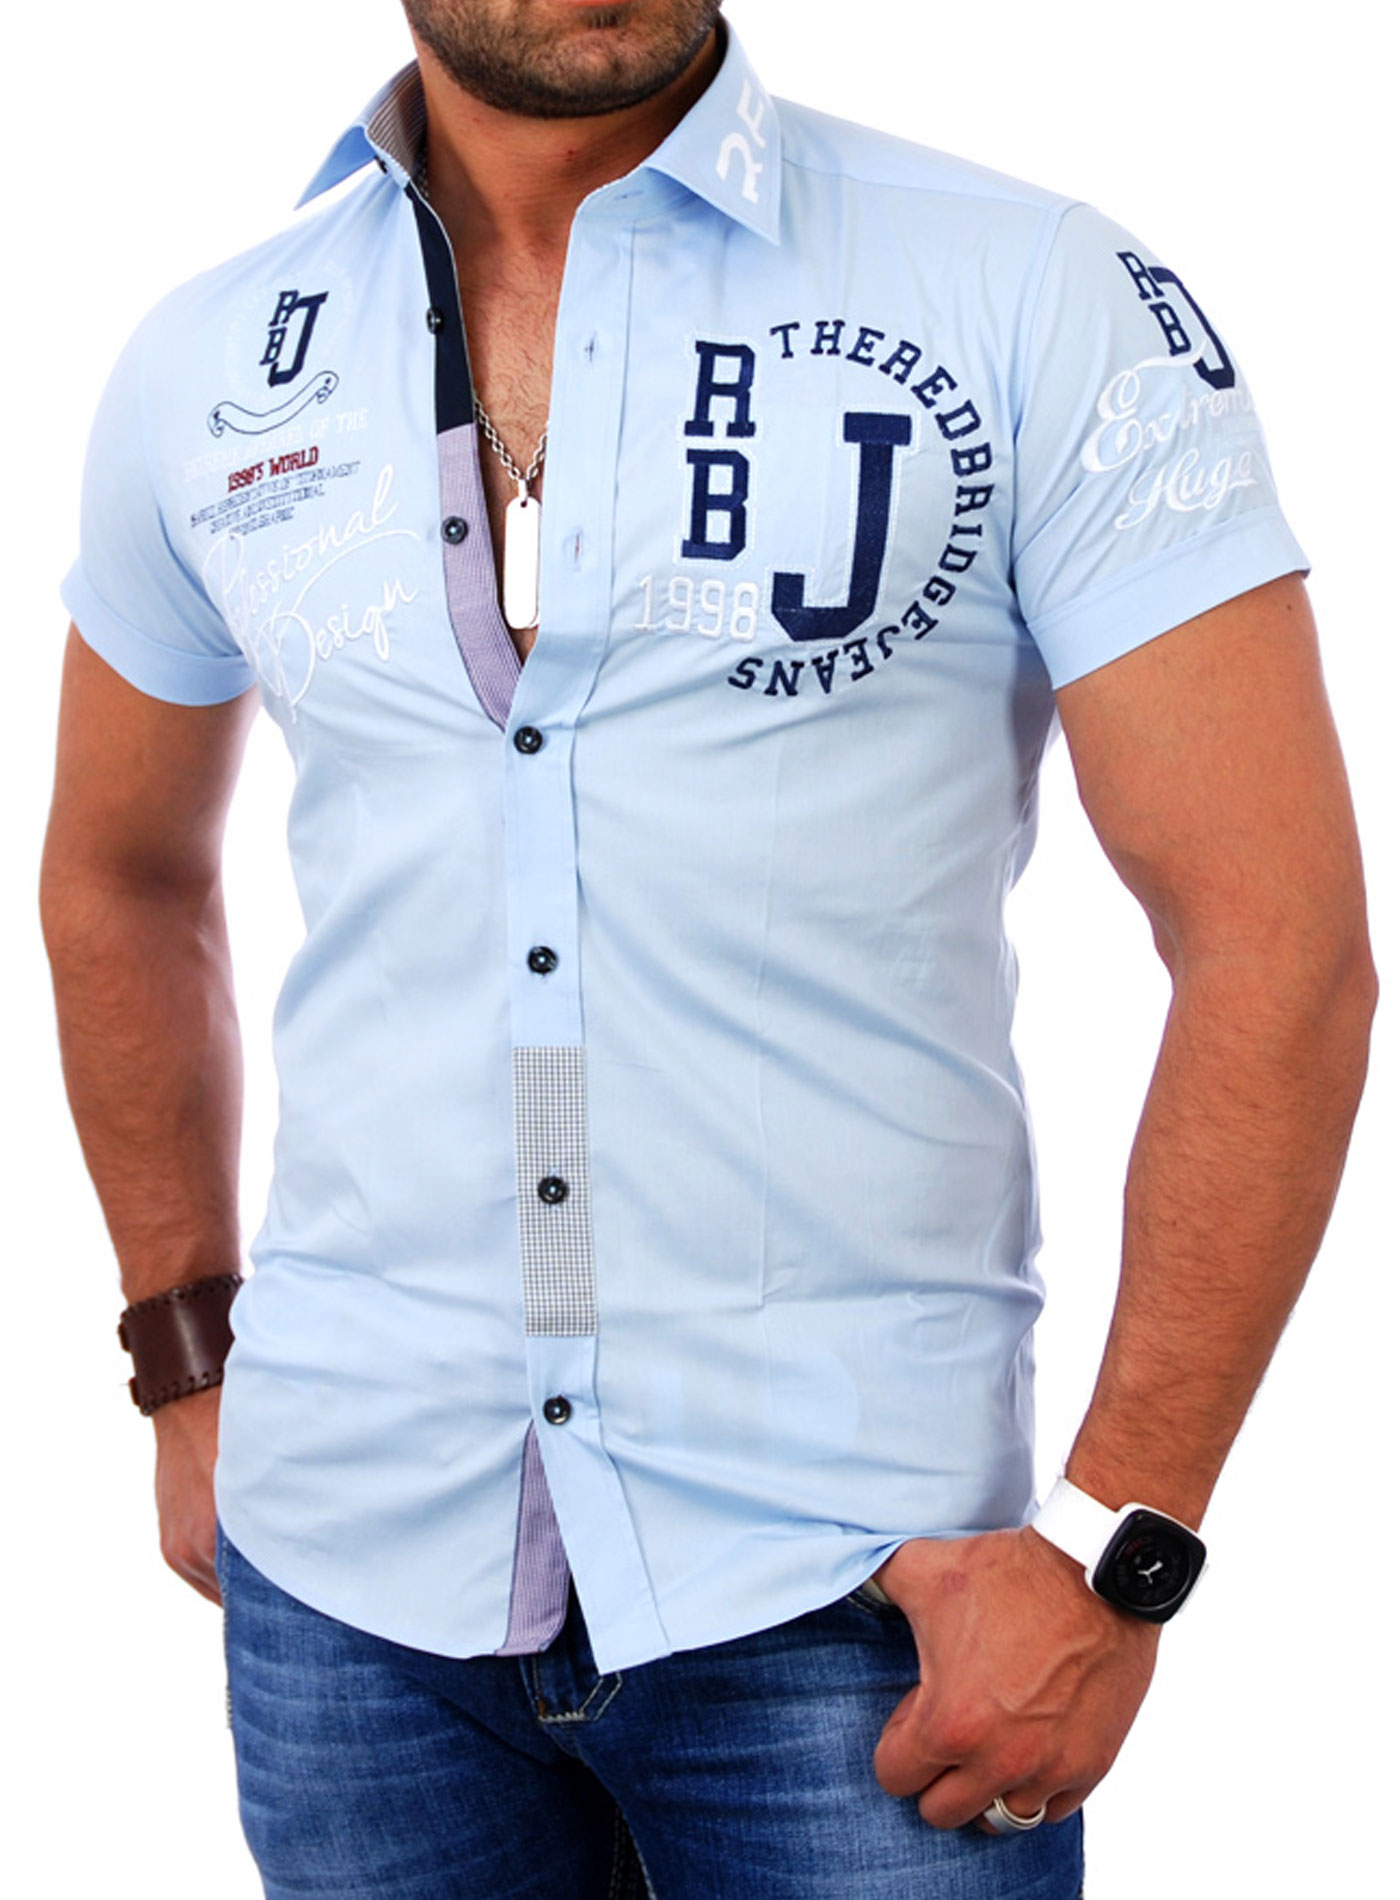 redbridge rb 2123 herren polo style kurzarm hemd poloshirt t shirt neu. Black Bedroom Furniture Sets. Home Design Ideas